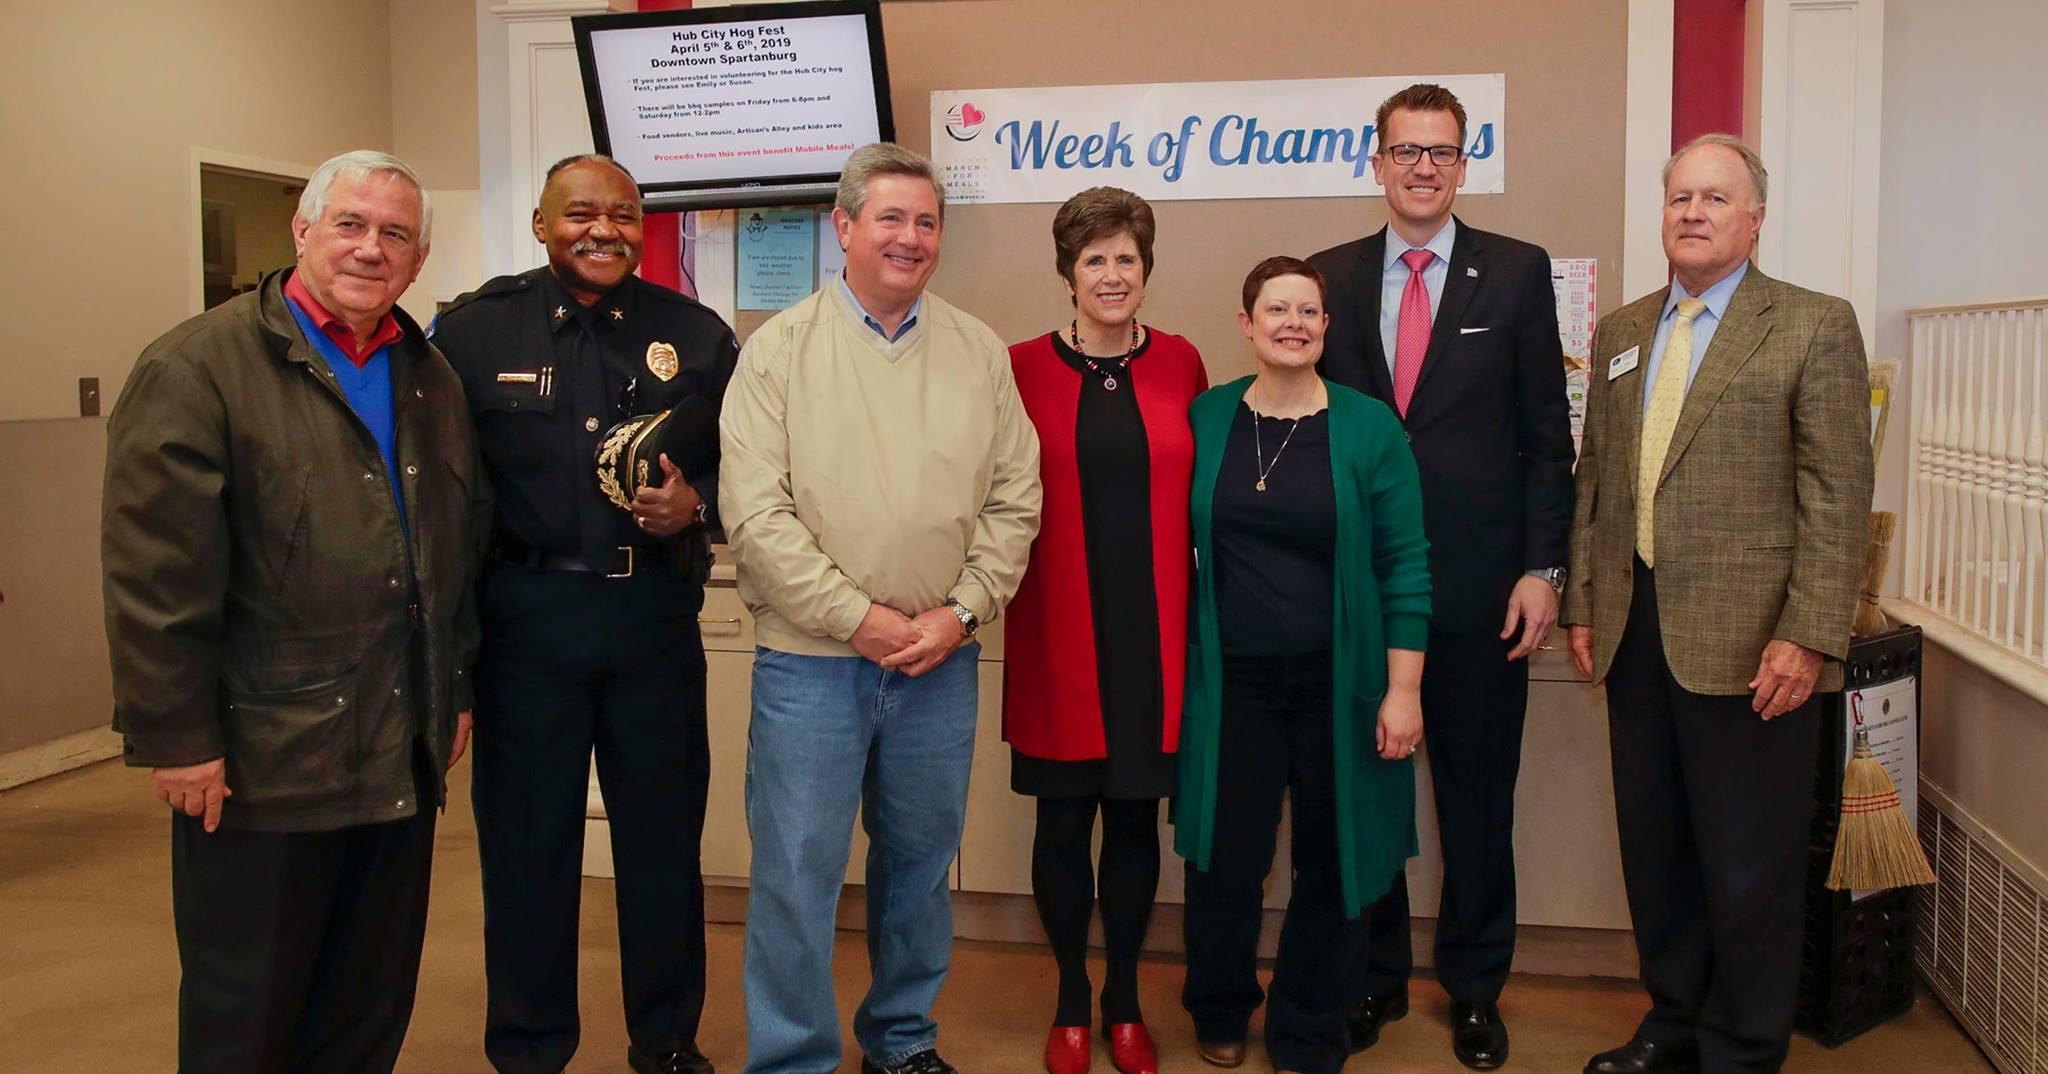 Community Champions Week